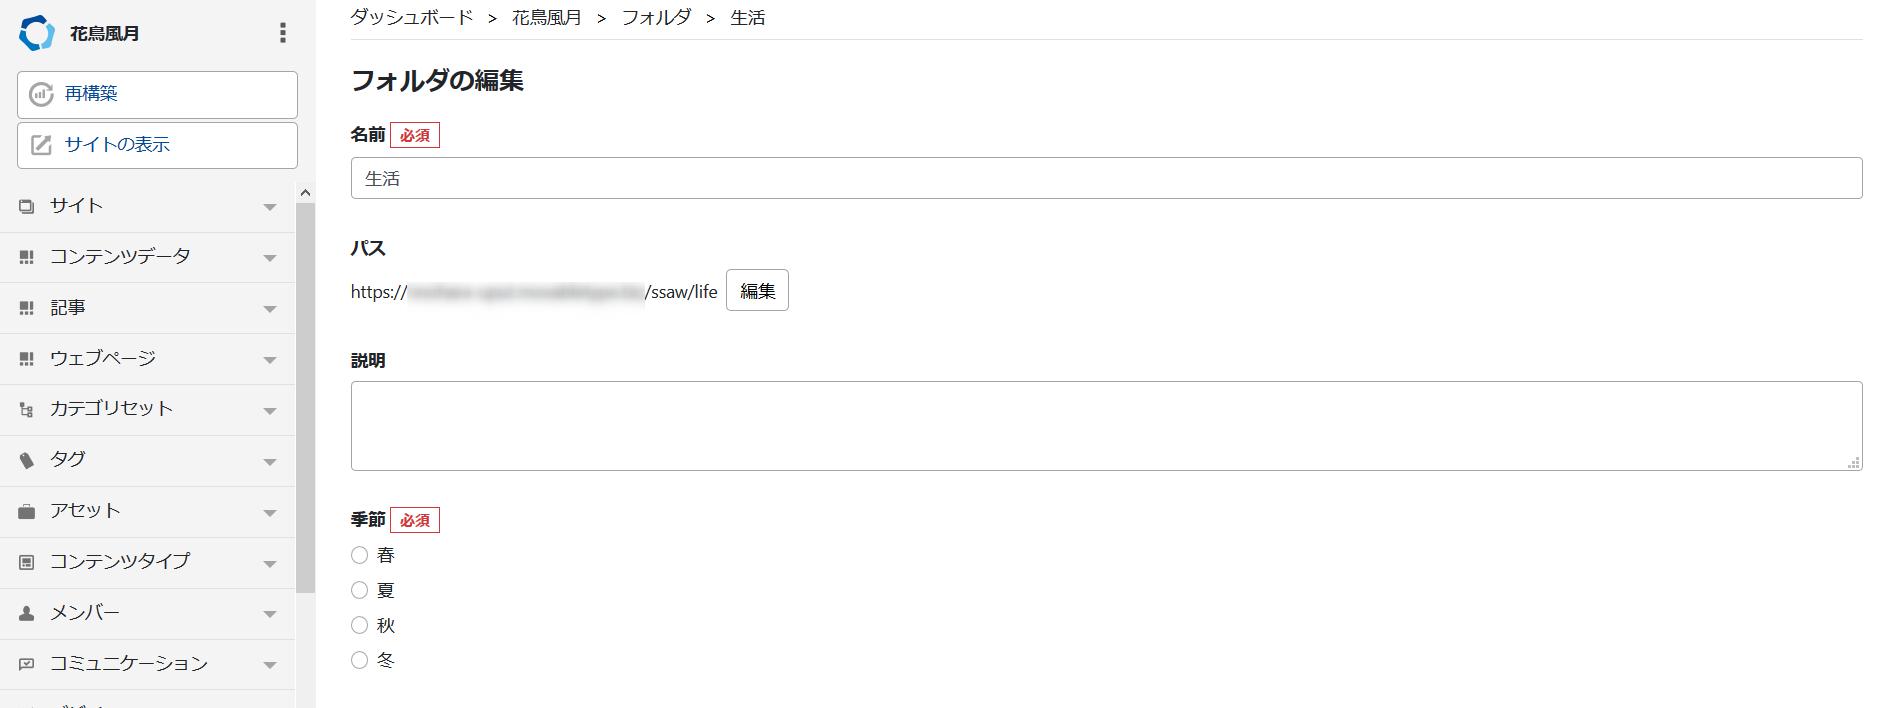 edit-folder02.png